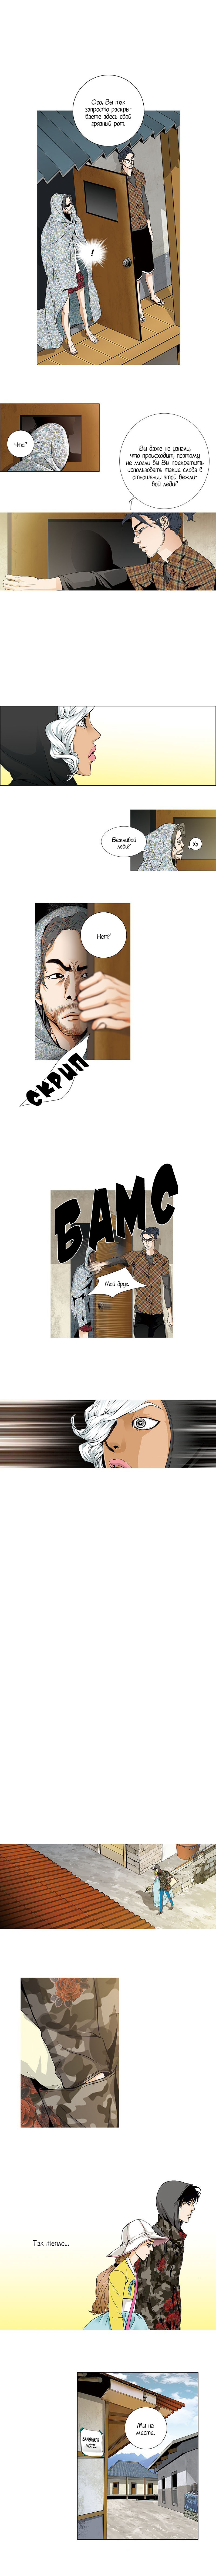 https://r1.ninemanga.com/comics/pic2/29/28573/344322/1512078368971.jpg Page 5